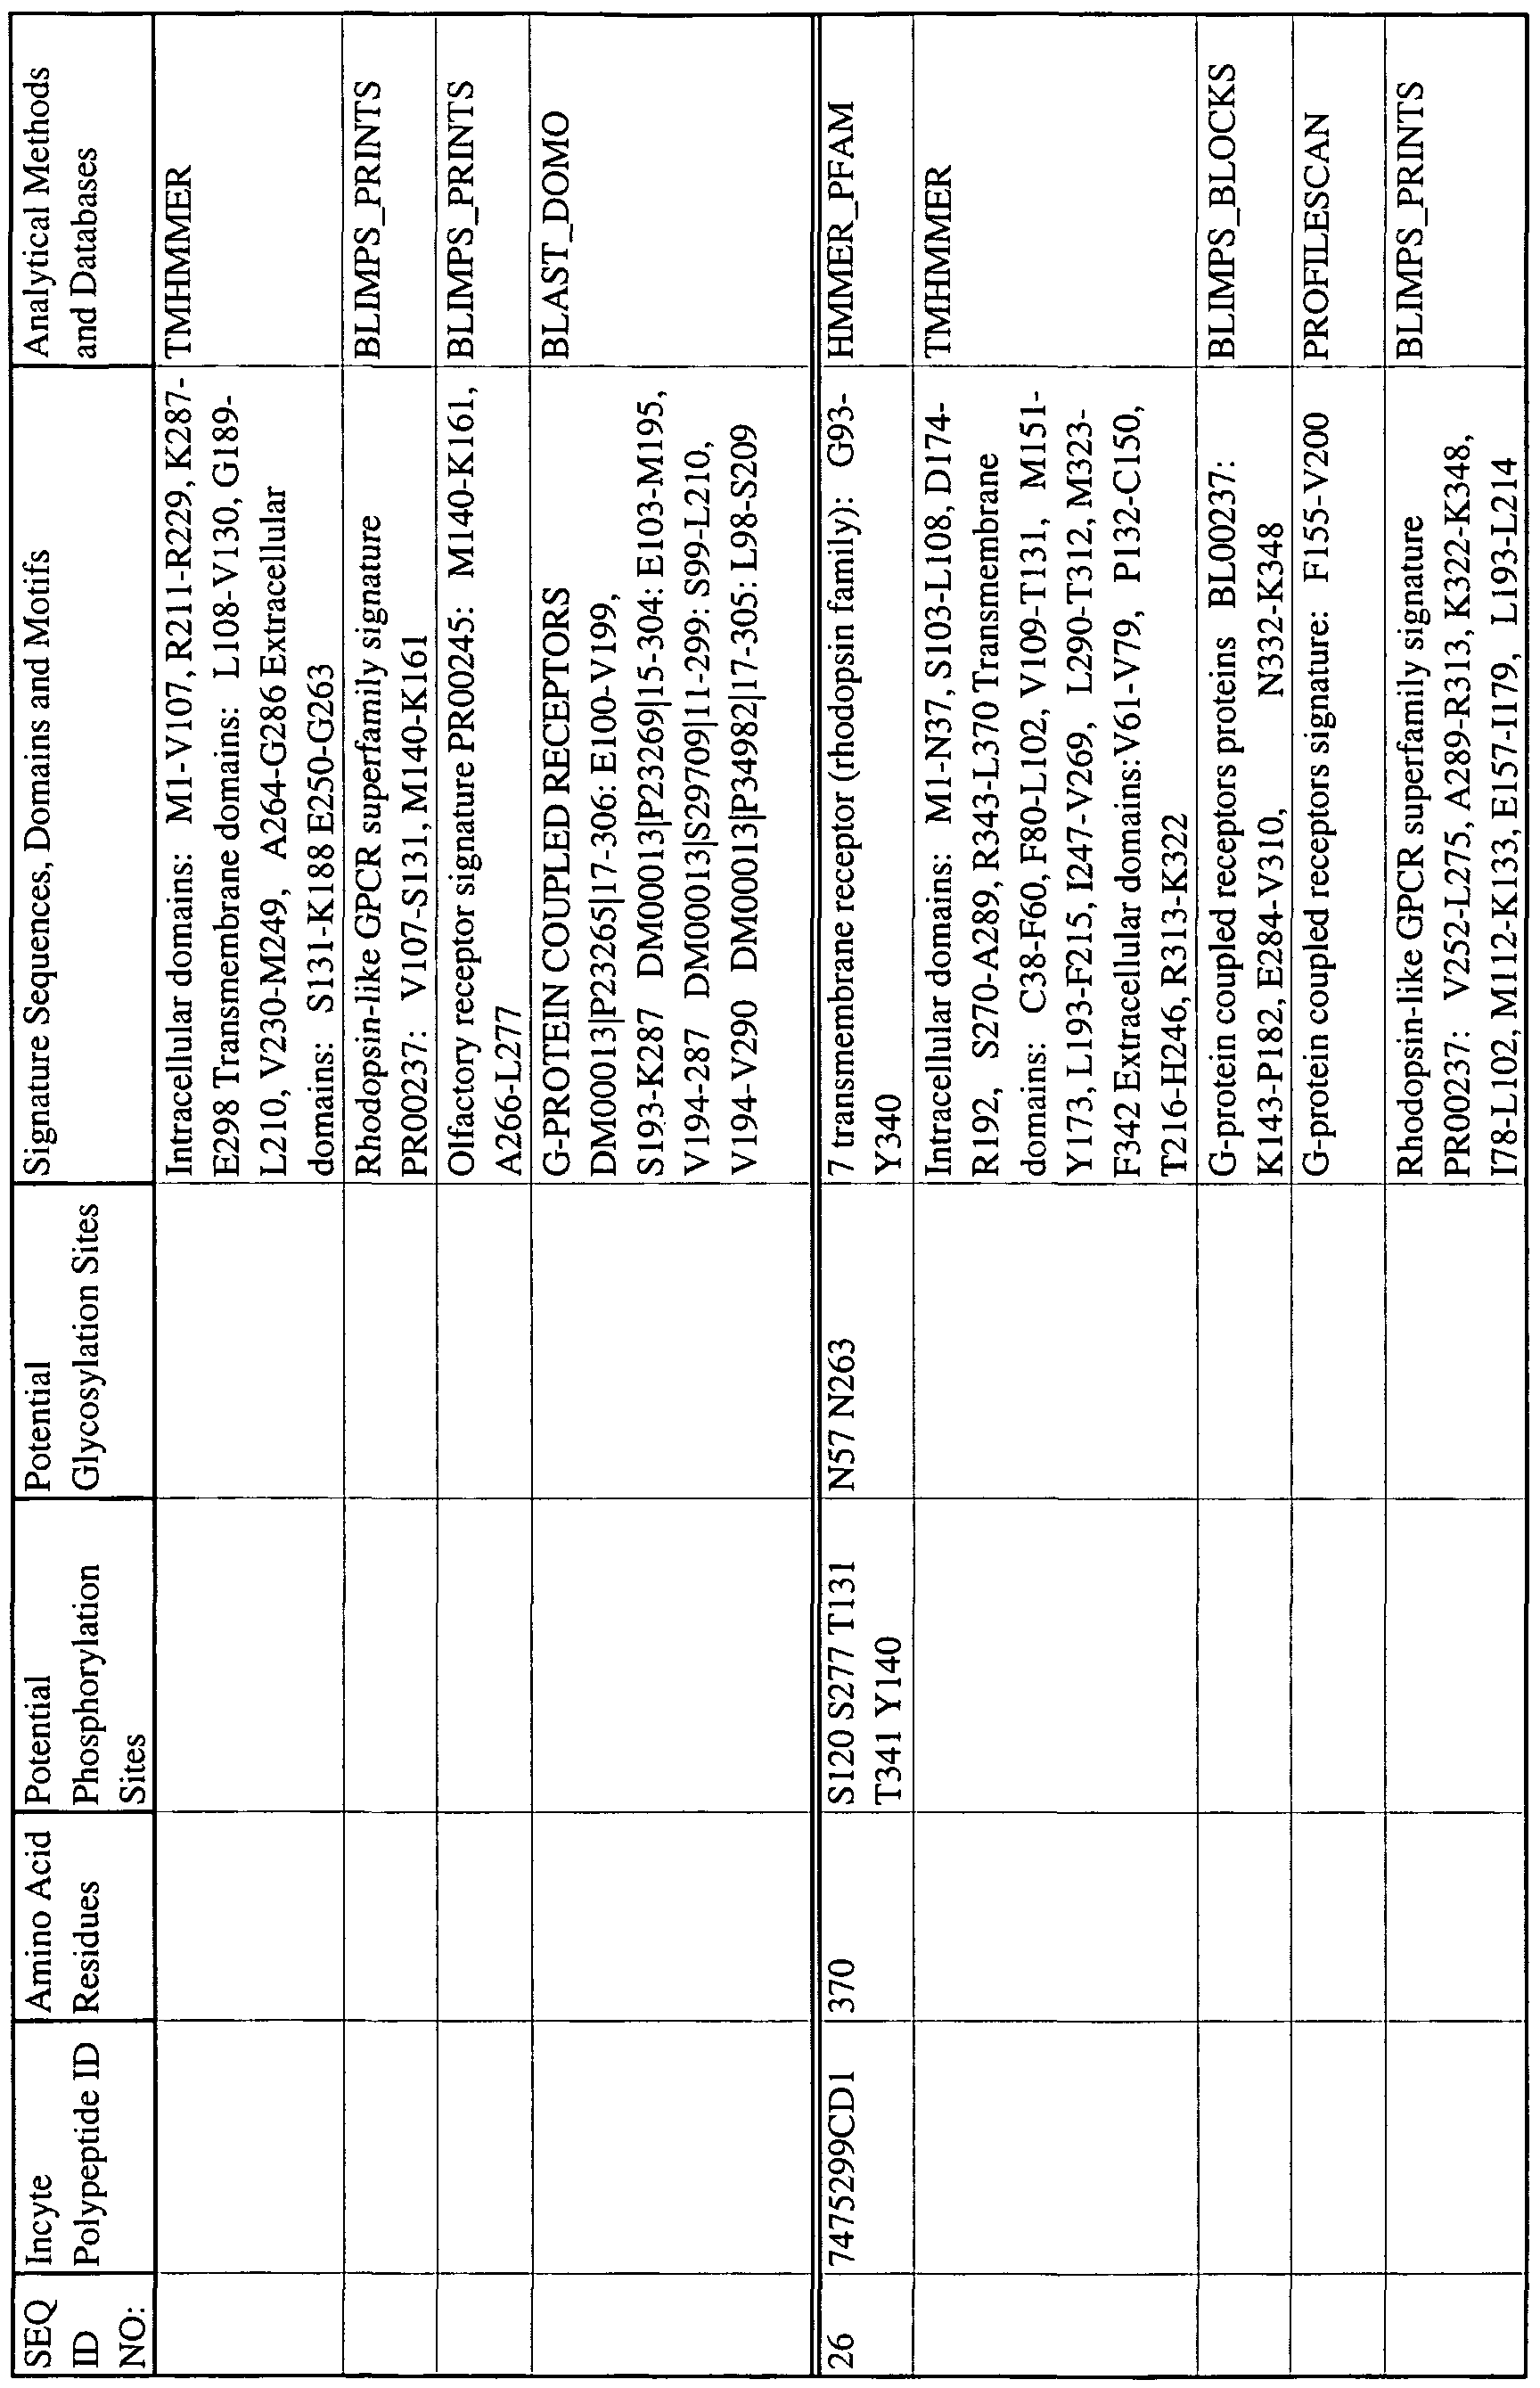 M112 302 Adapter